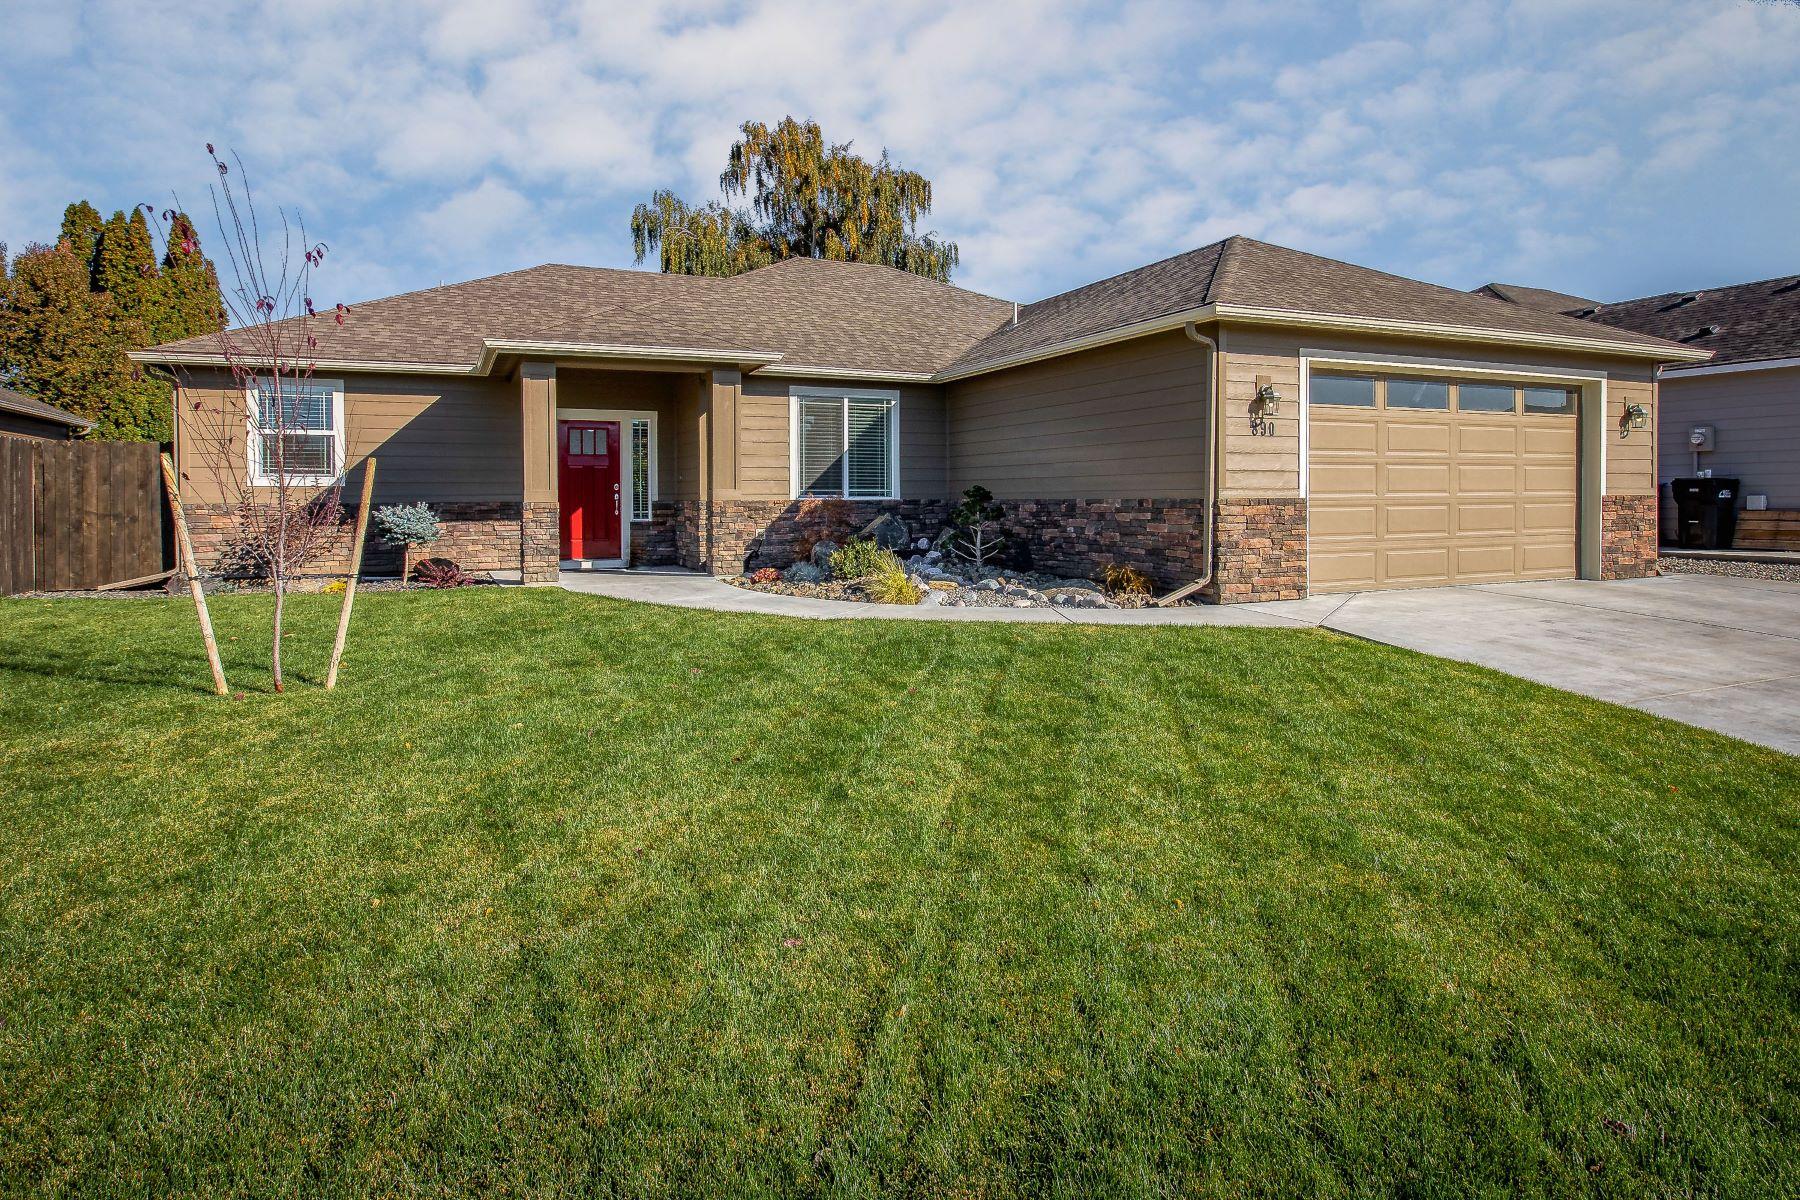 Single Family Homes for Sale at 890 Boulder Street Walla Walla, Washington 99362 United States